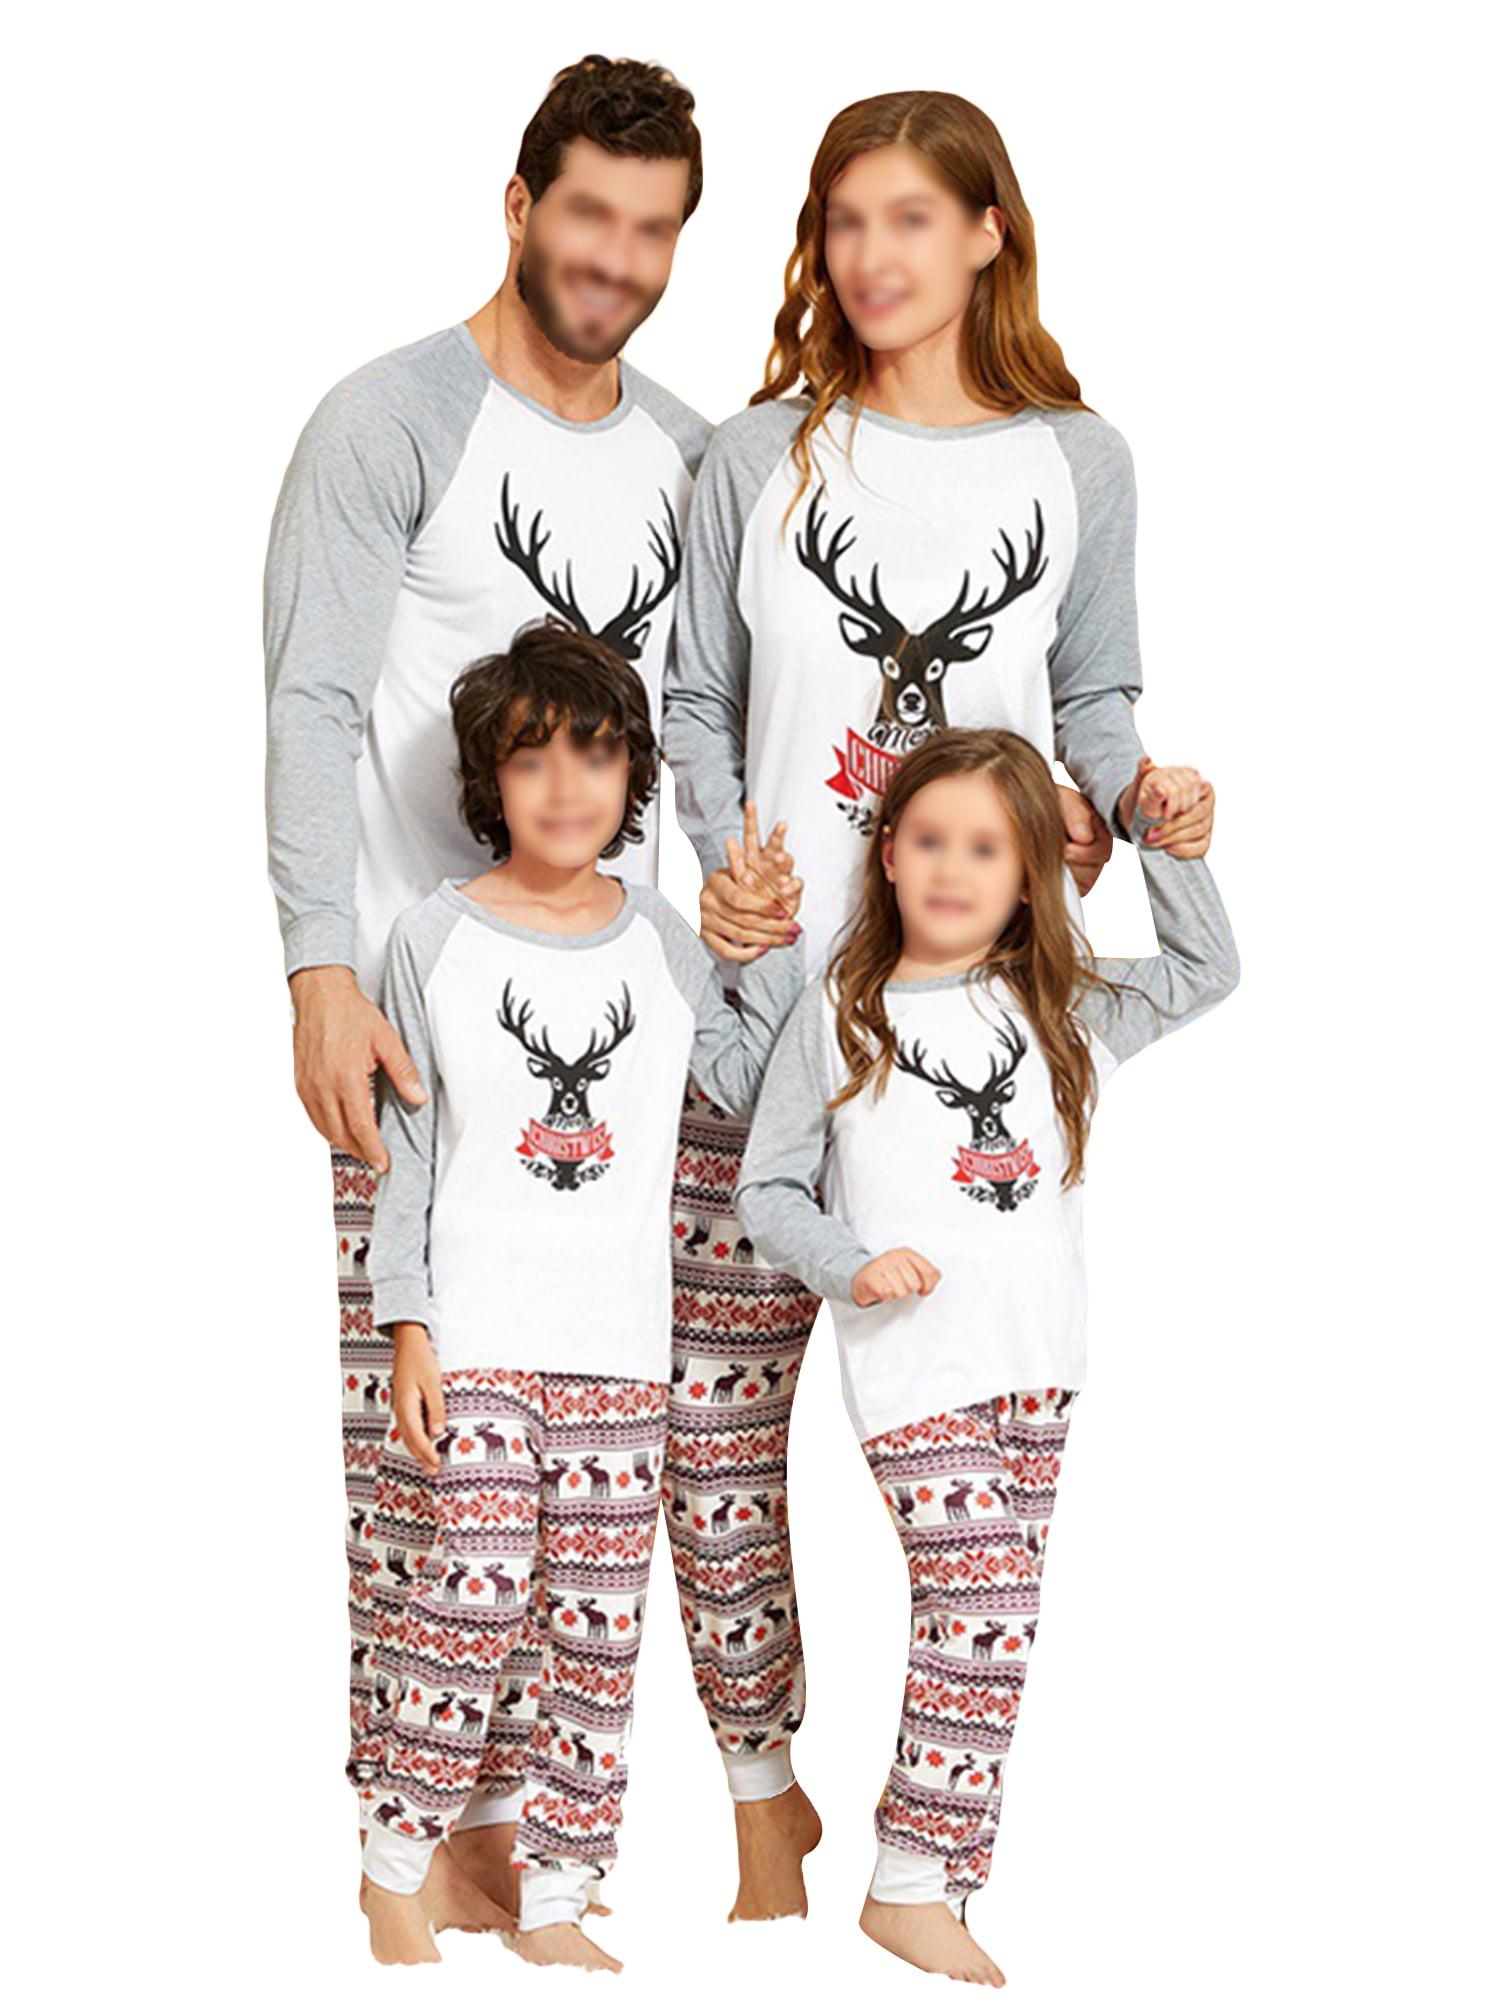 Stripes Christmas Family Matching Pyjamas Men Women Kids PJ Sets Xmas Sleepwear